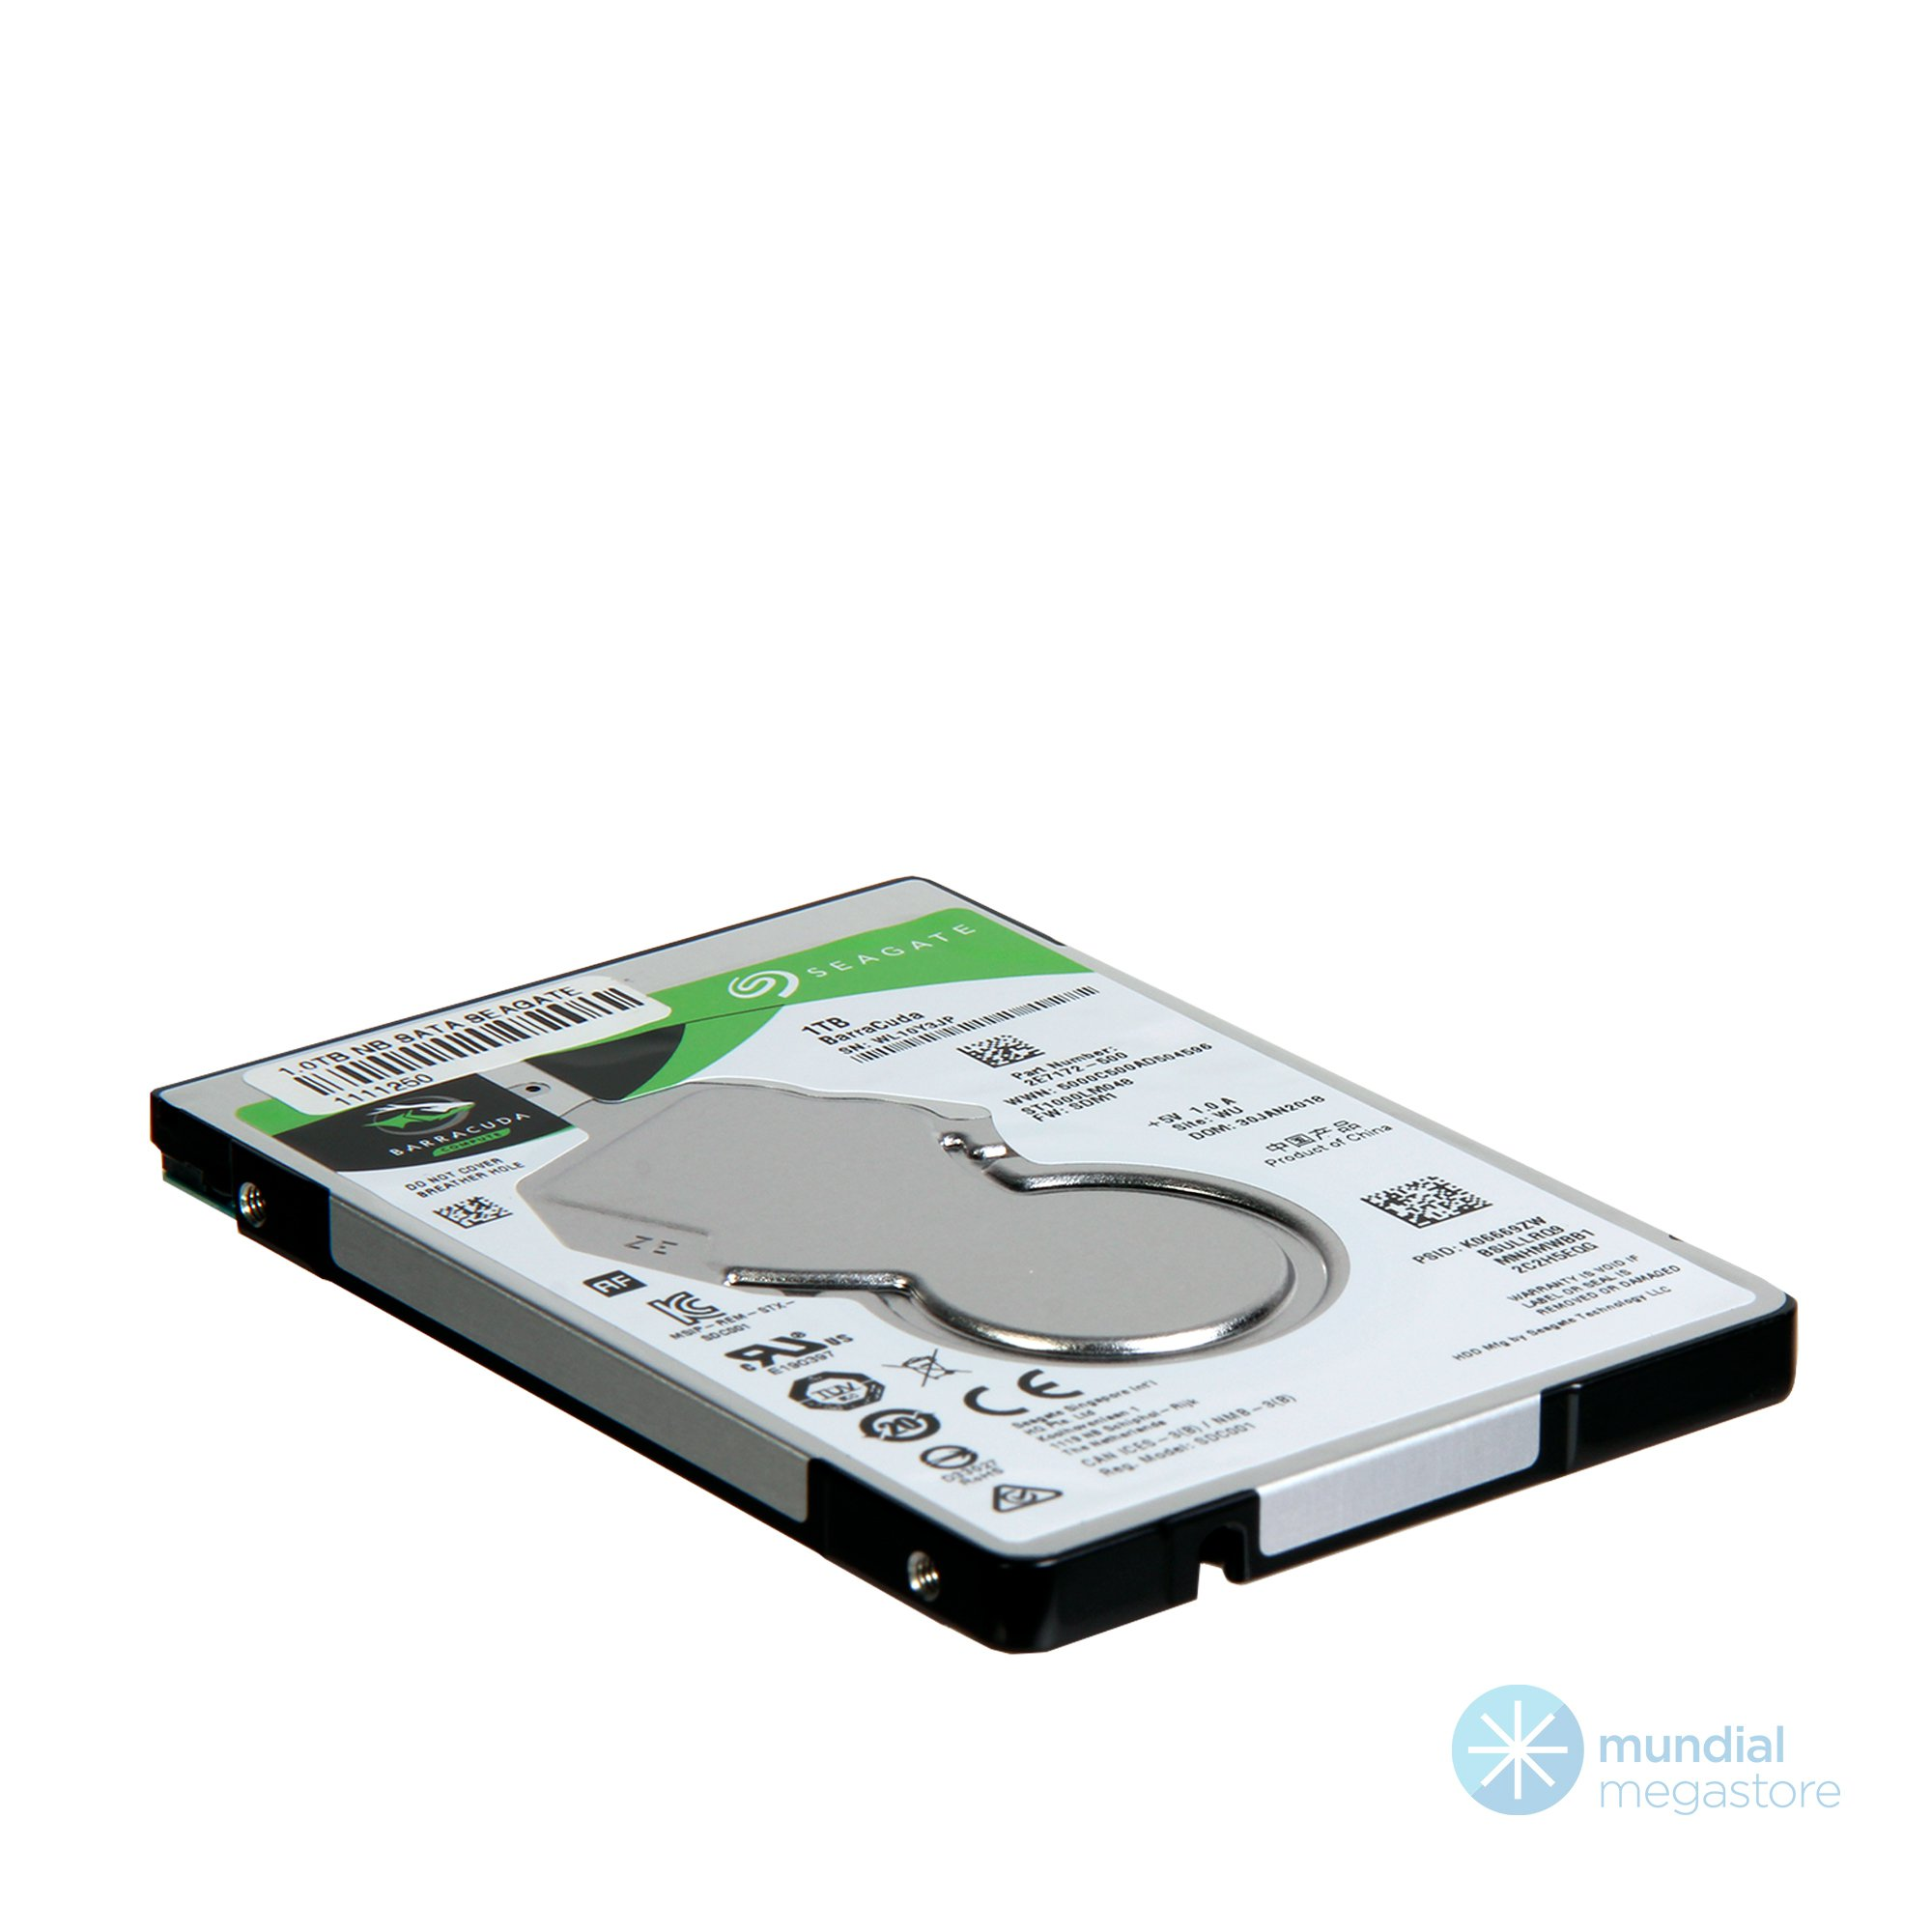 hd sata notebook 10tb seagate 36805 2000 195857